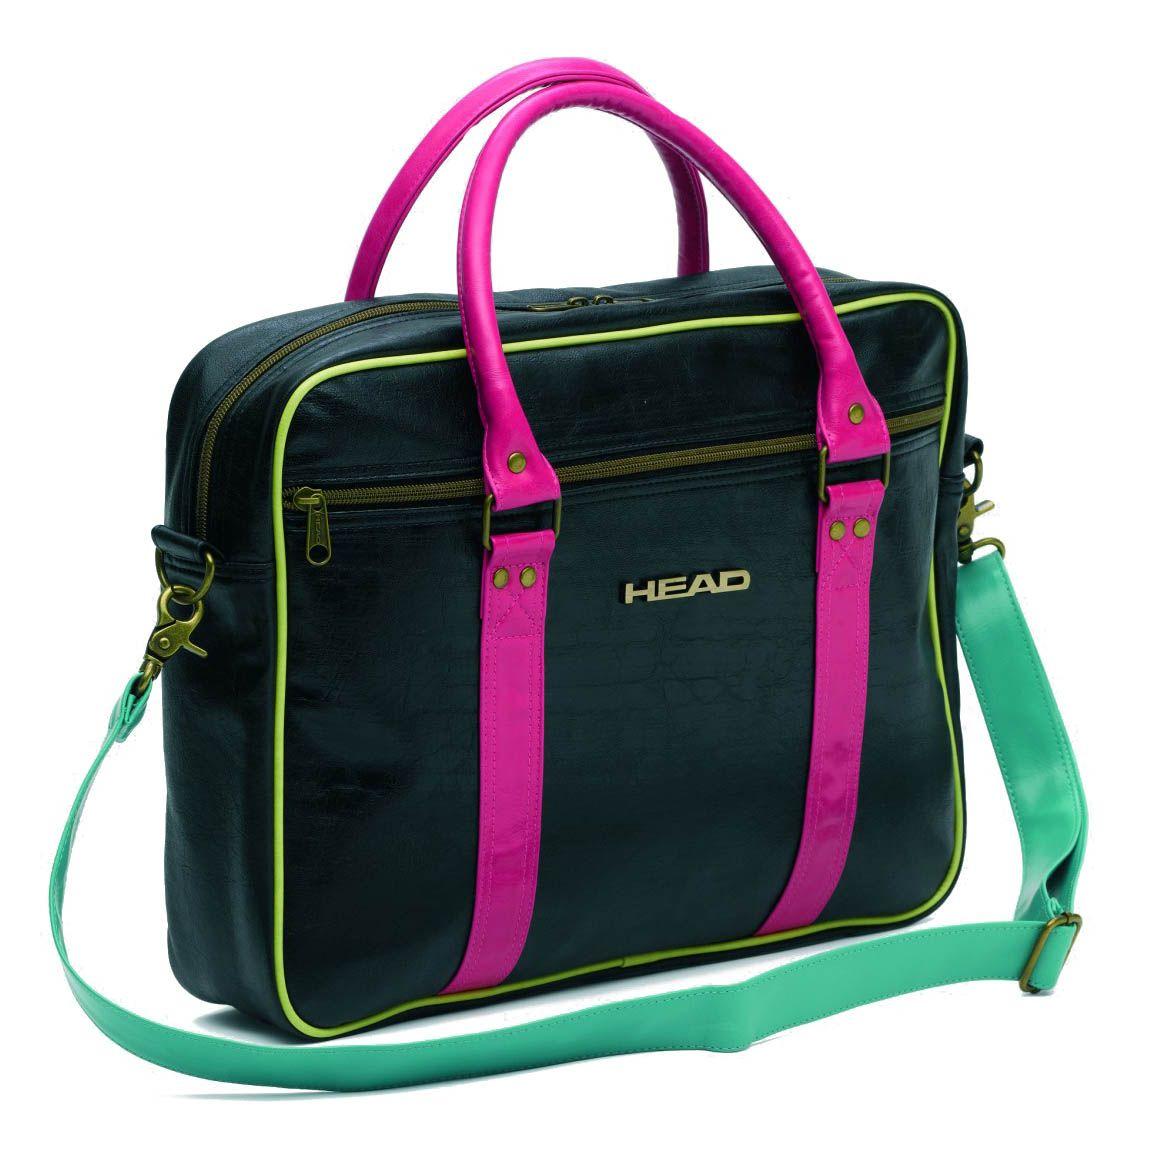 Elastic Golf Trolley Straps in addition Head Travel Laptop Bag further Bag boy t 700 travel bag further 14320983 additionally 389 Tent Pole Bags C ing Bag Equipment Storage Bag. on golf cart bag strap